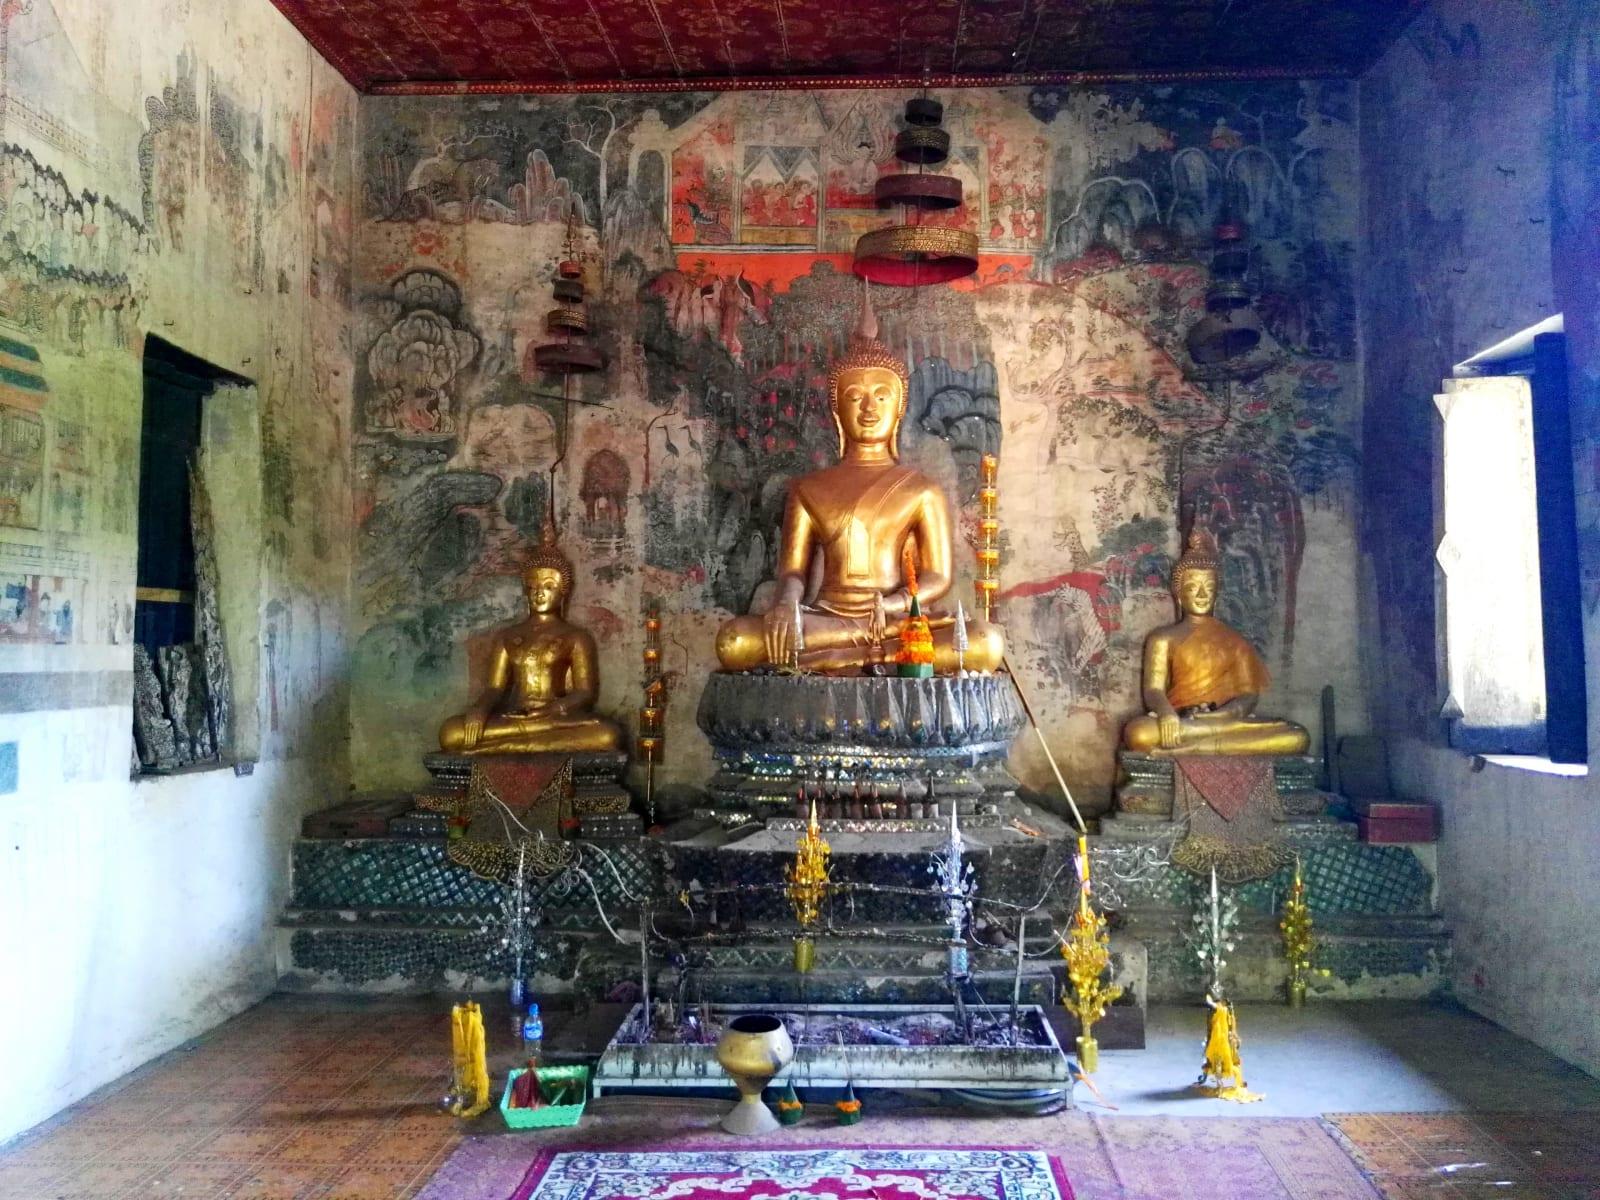 Chrám v dolní části Mount Phousi, Luang Prabang, Laos